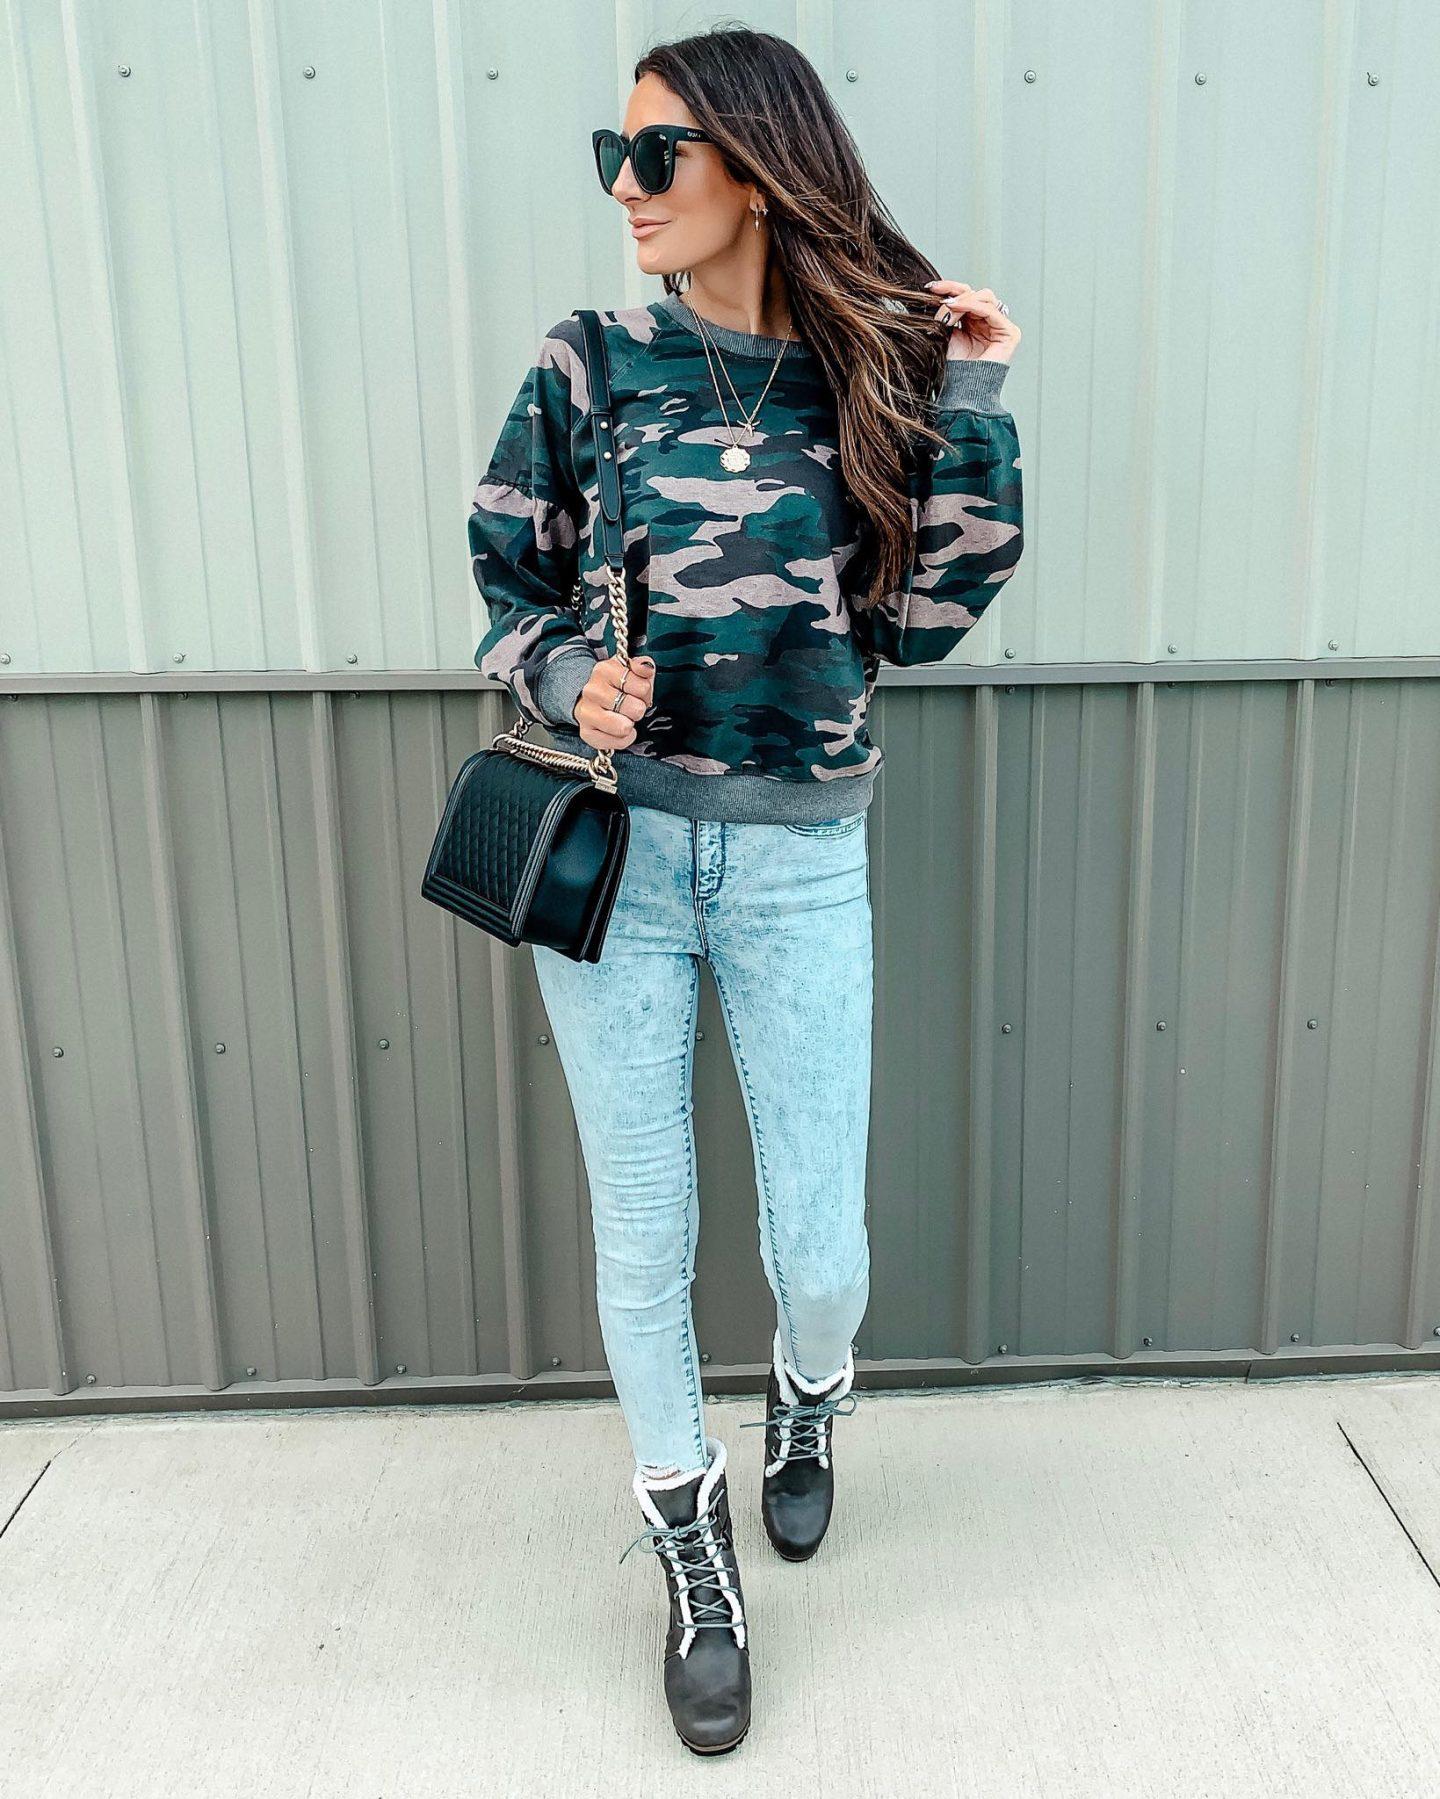 Fall Fashion Haul with Walmart